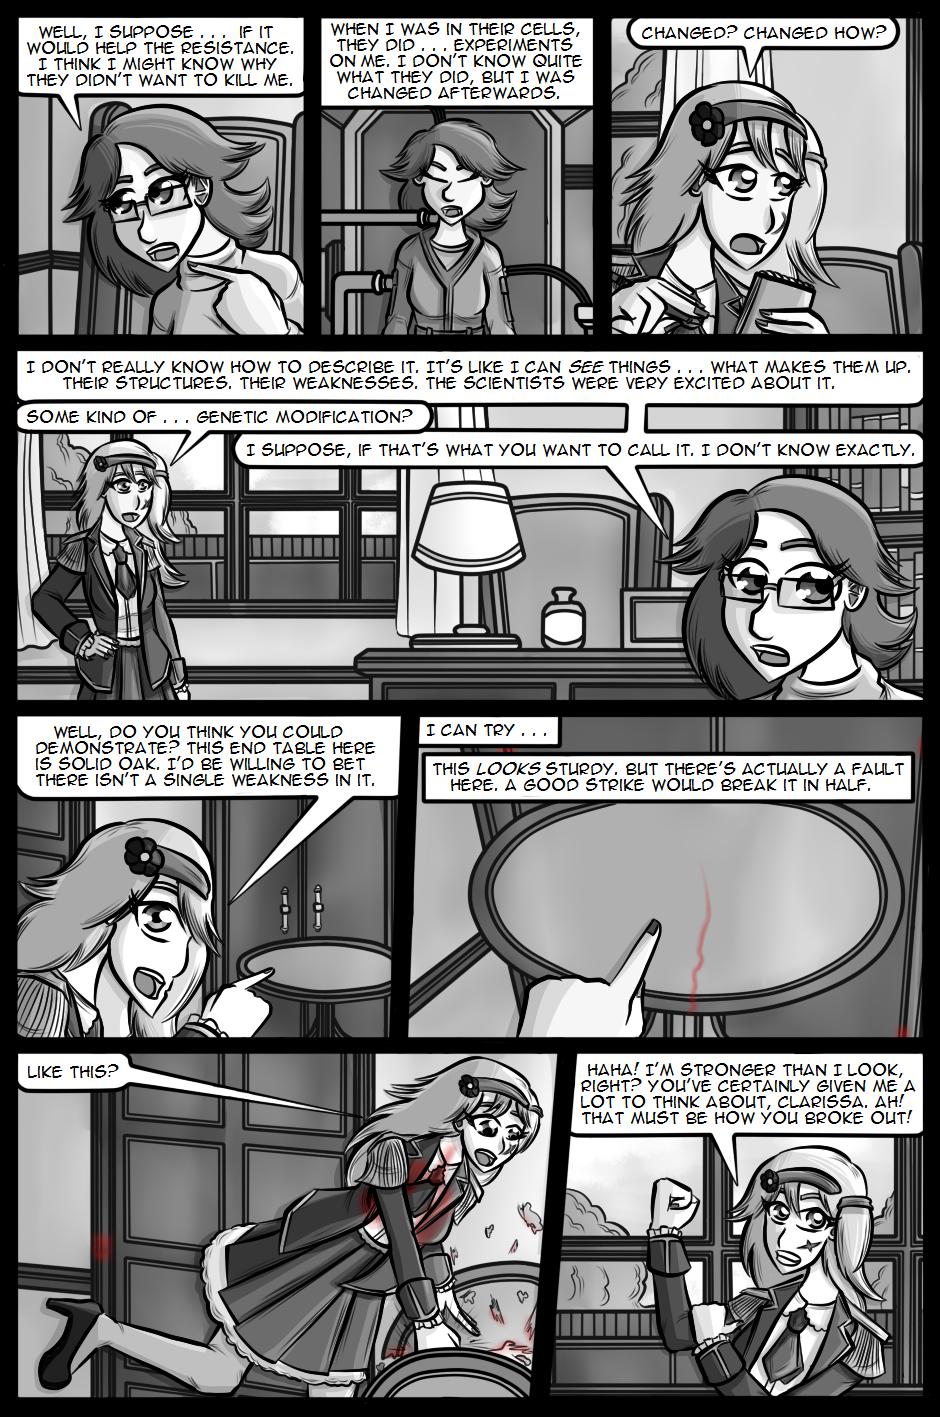 Fire Suppression, Part 5